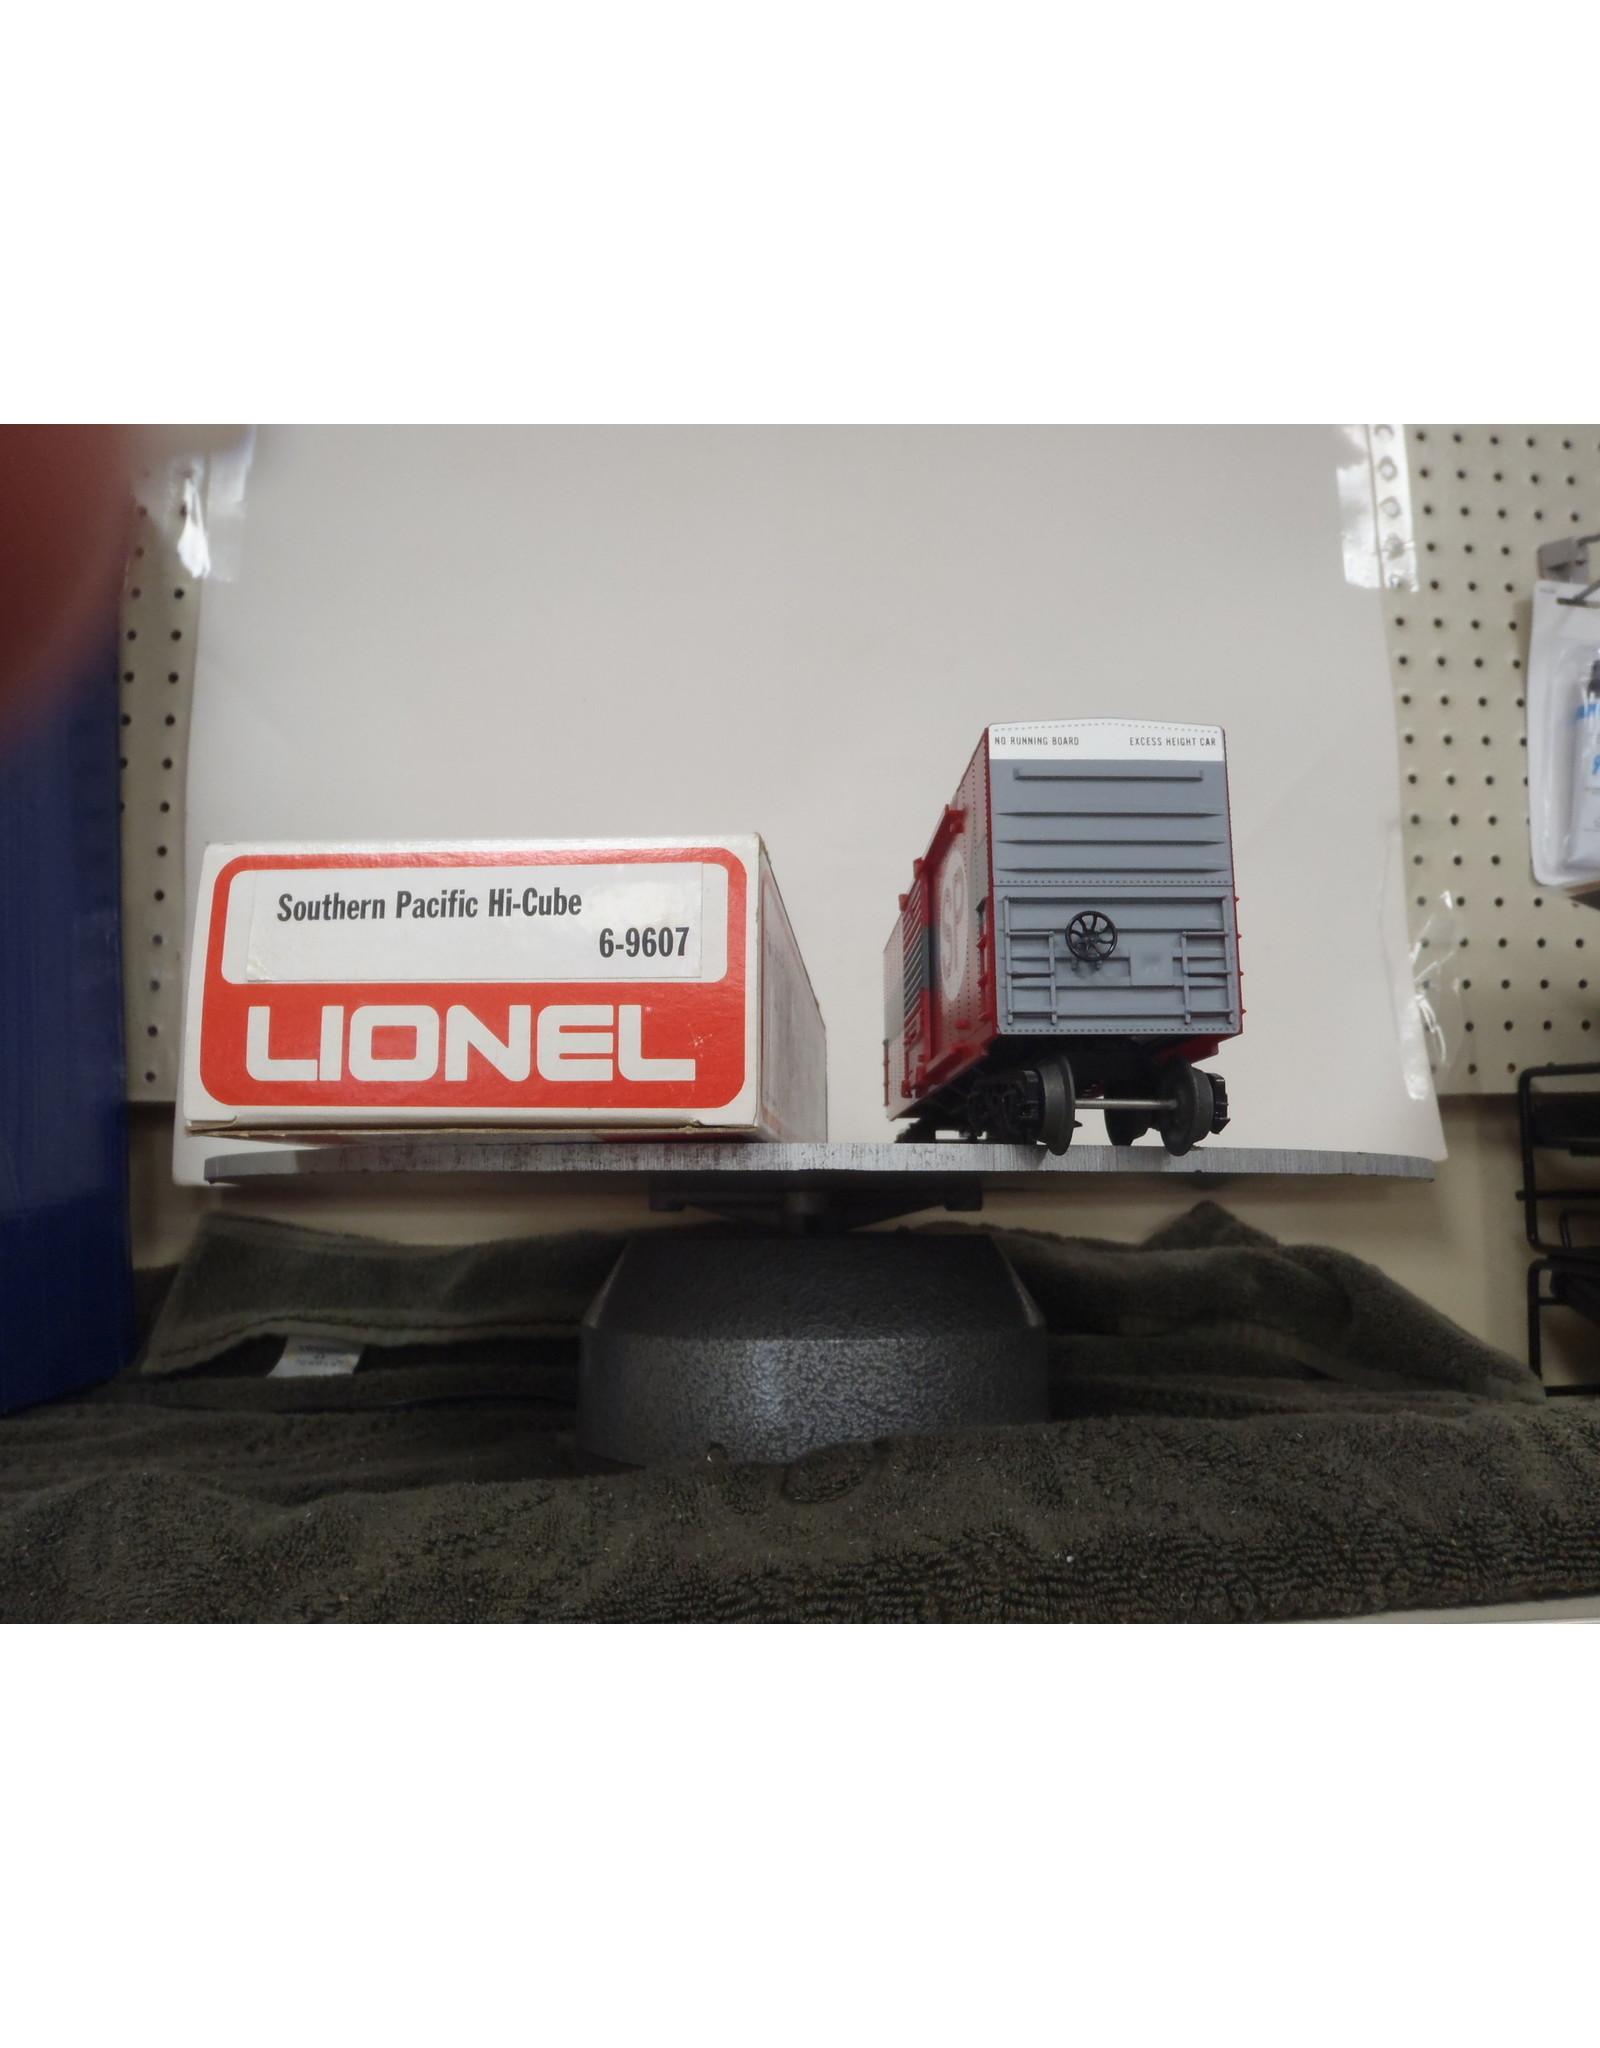 Lionel Boxcar Hi-Cube Southern Pacific 9607